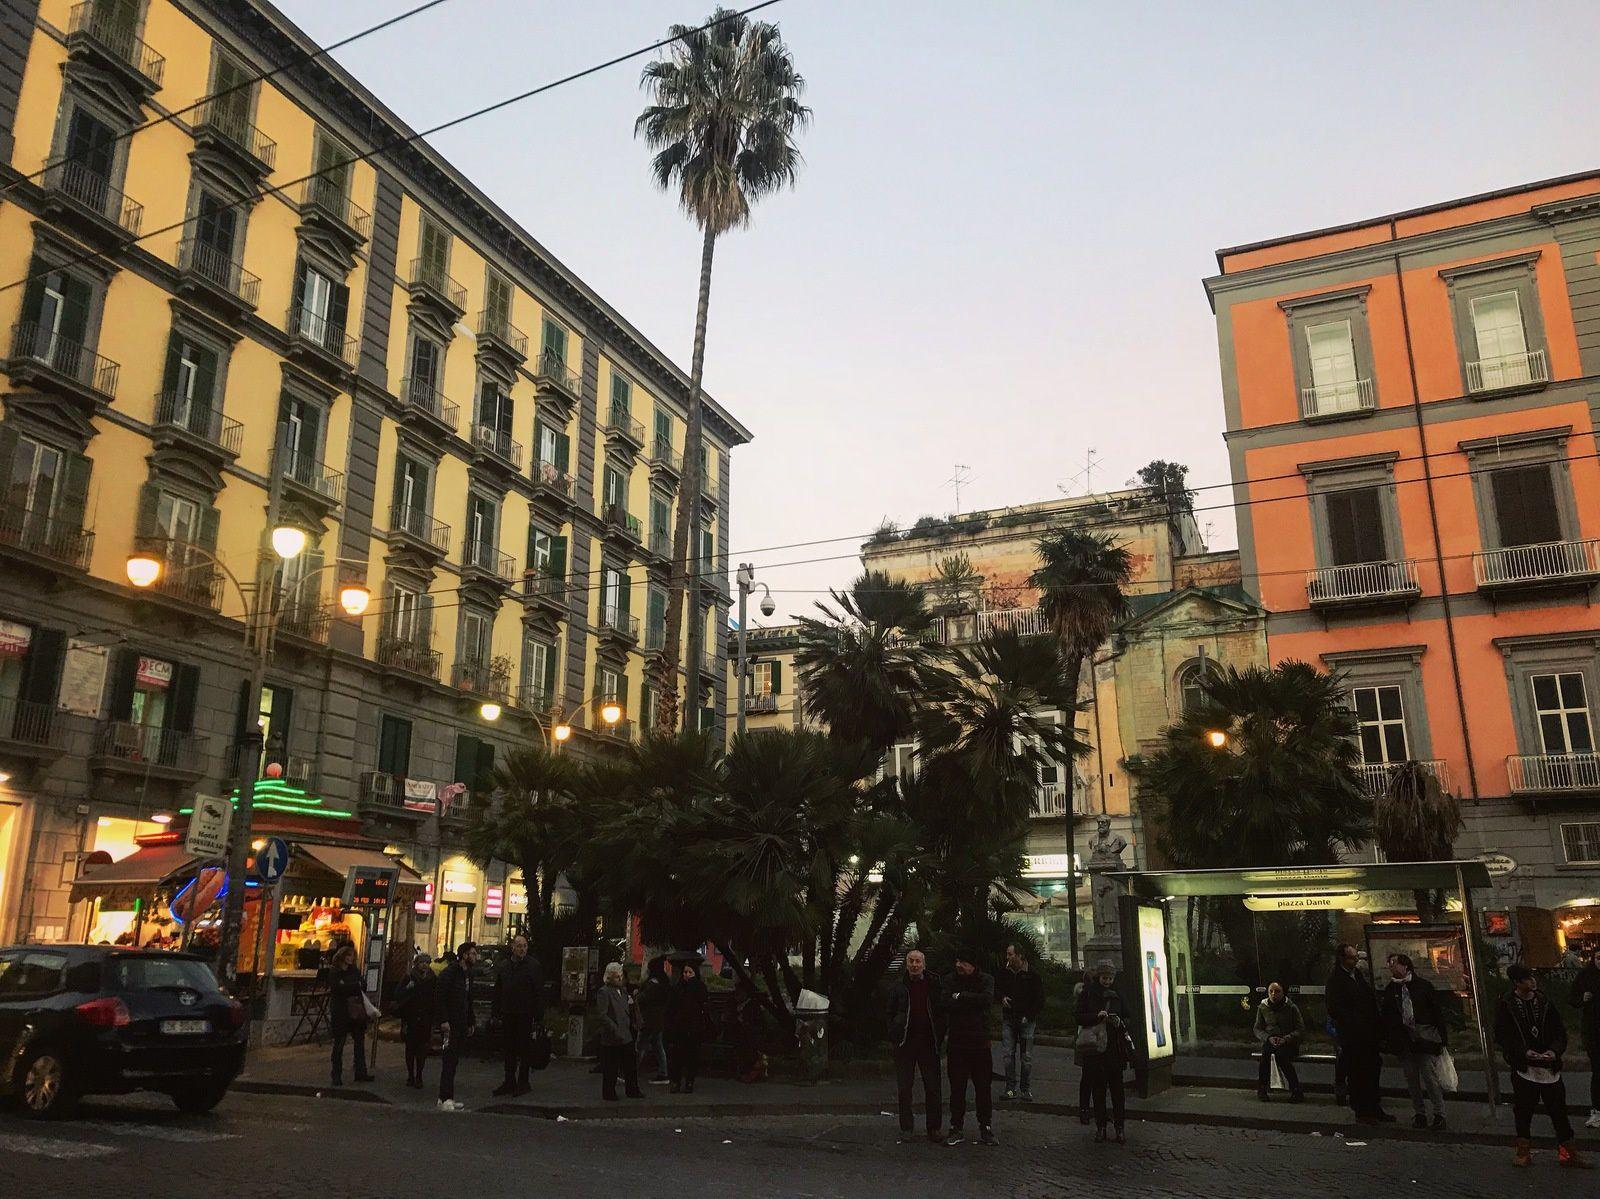 Napoli, Naples, Italia 🇮🇹